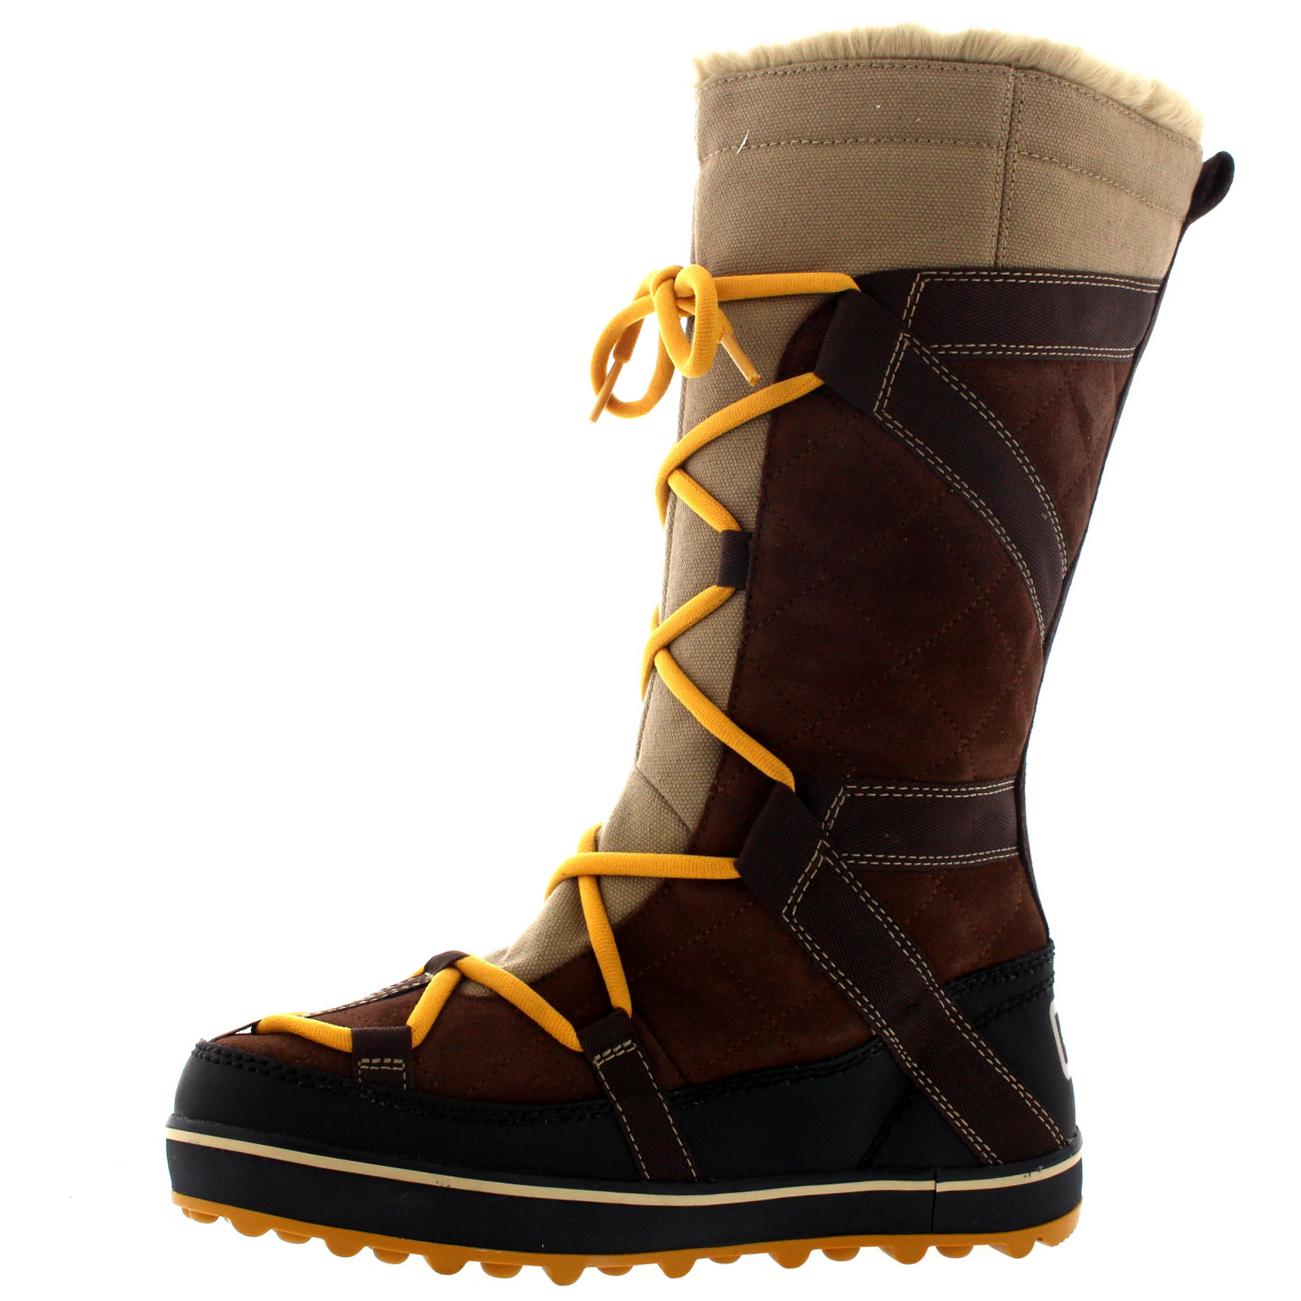 Womens Waterproof Shoes Snow